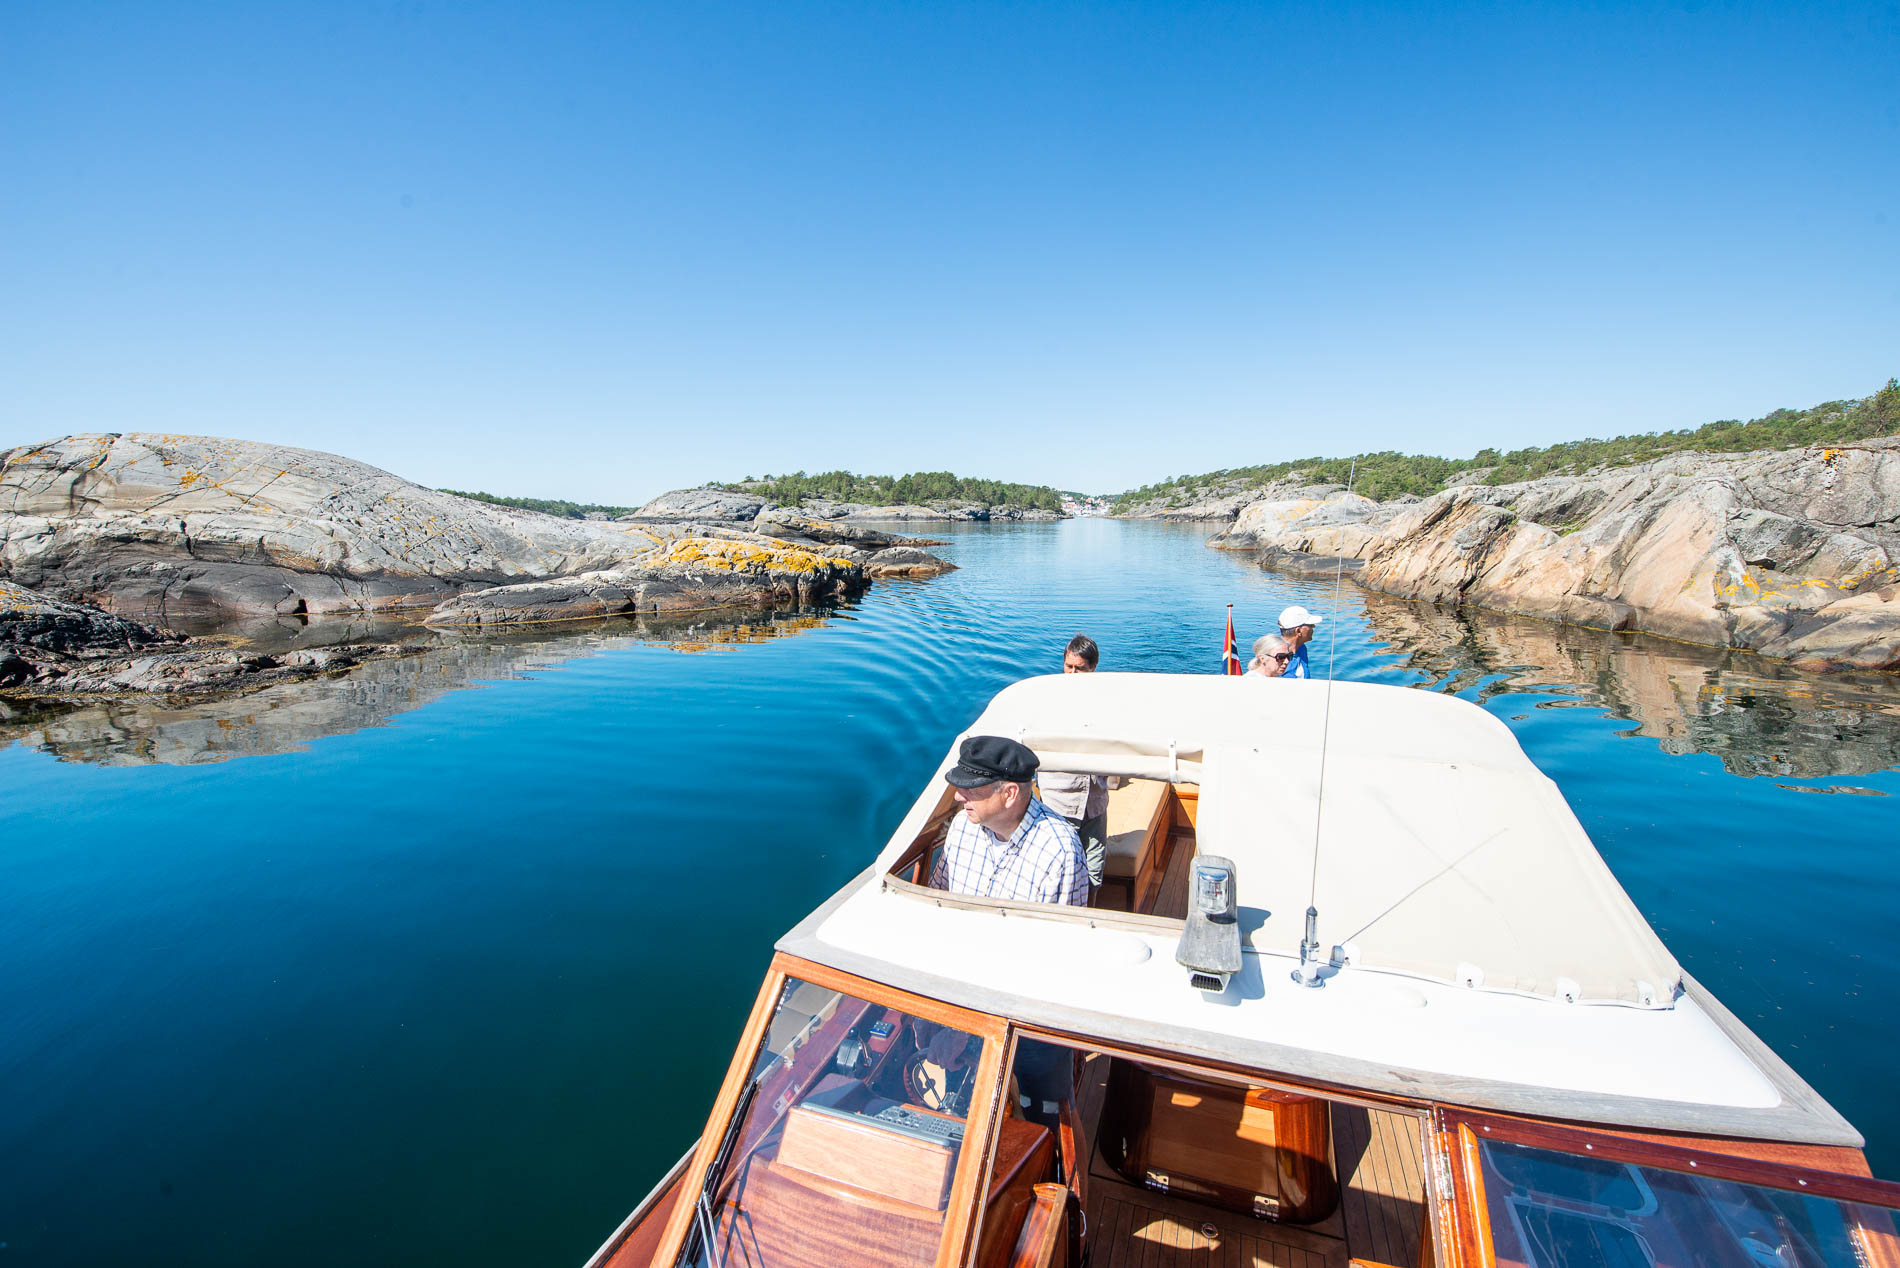 Boat trip in the archipelago